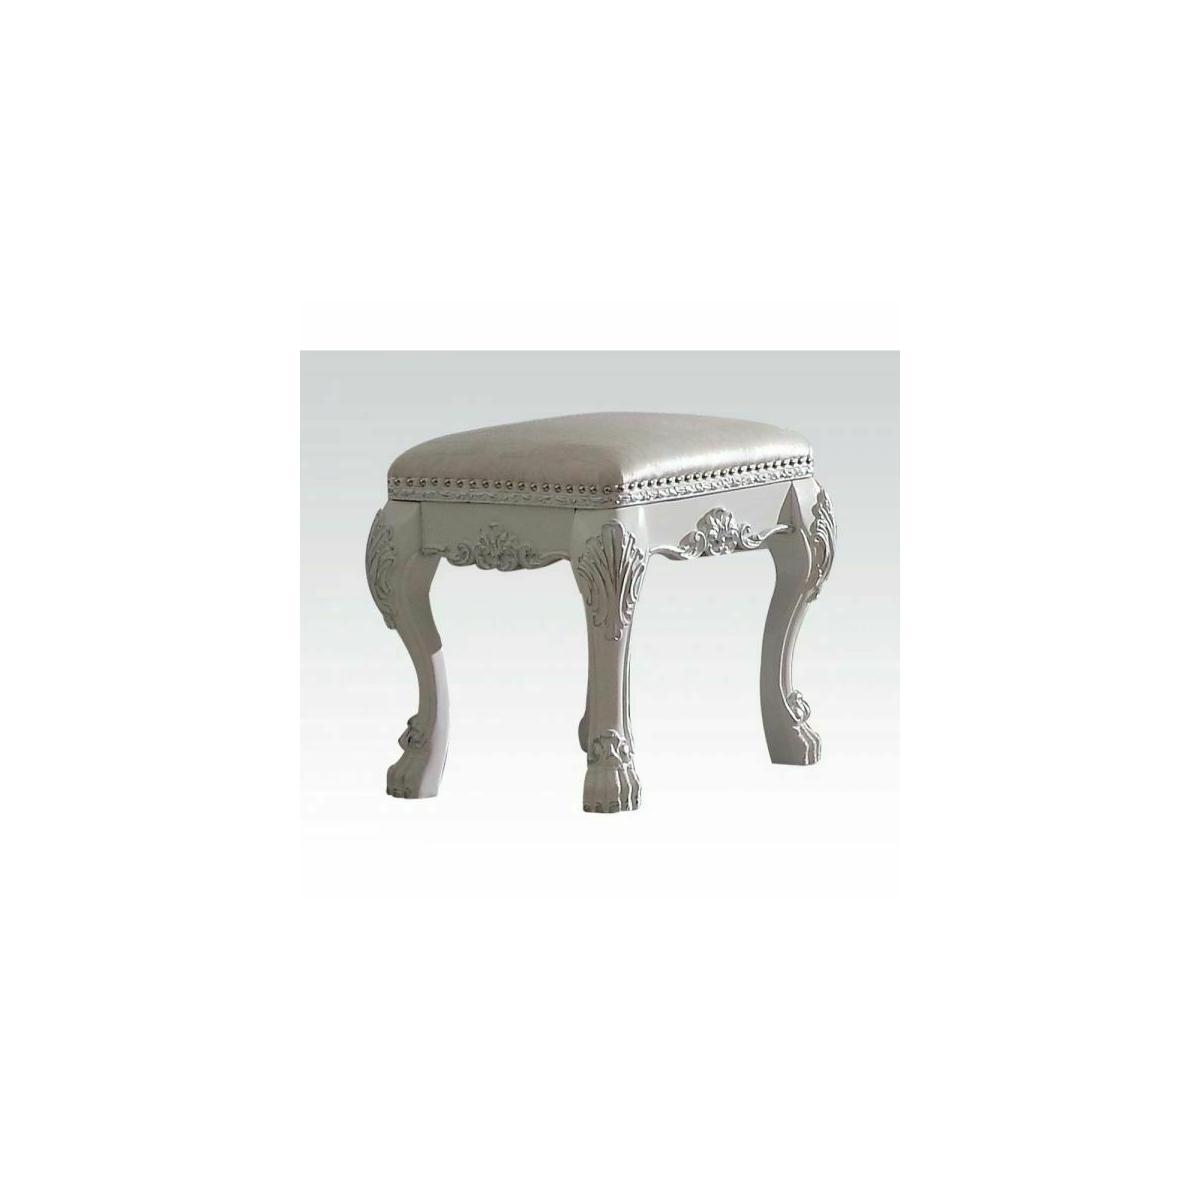 ACME Dresden Vanity Stool - 30671 - Antique White